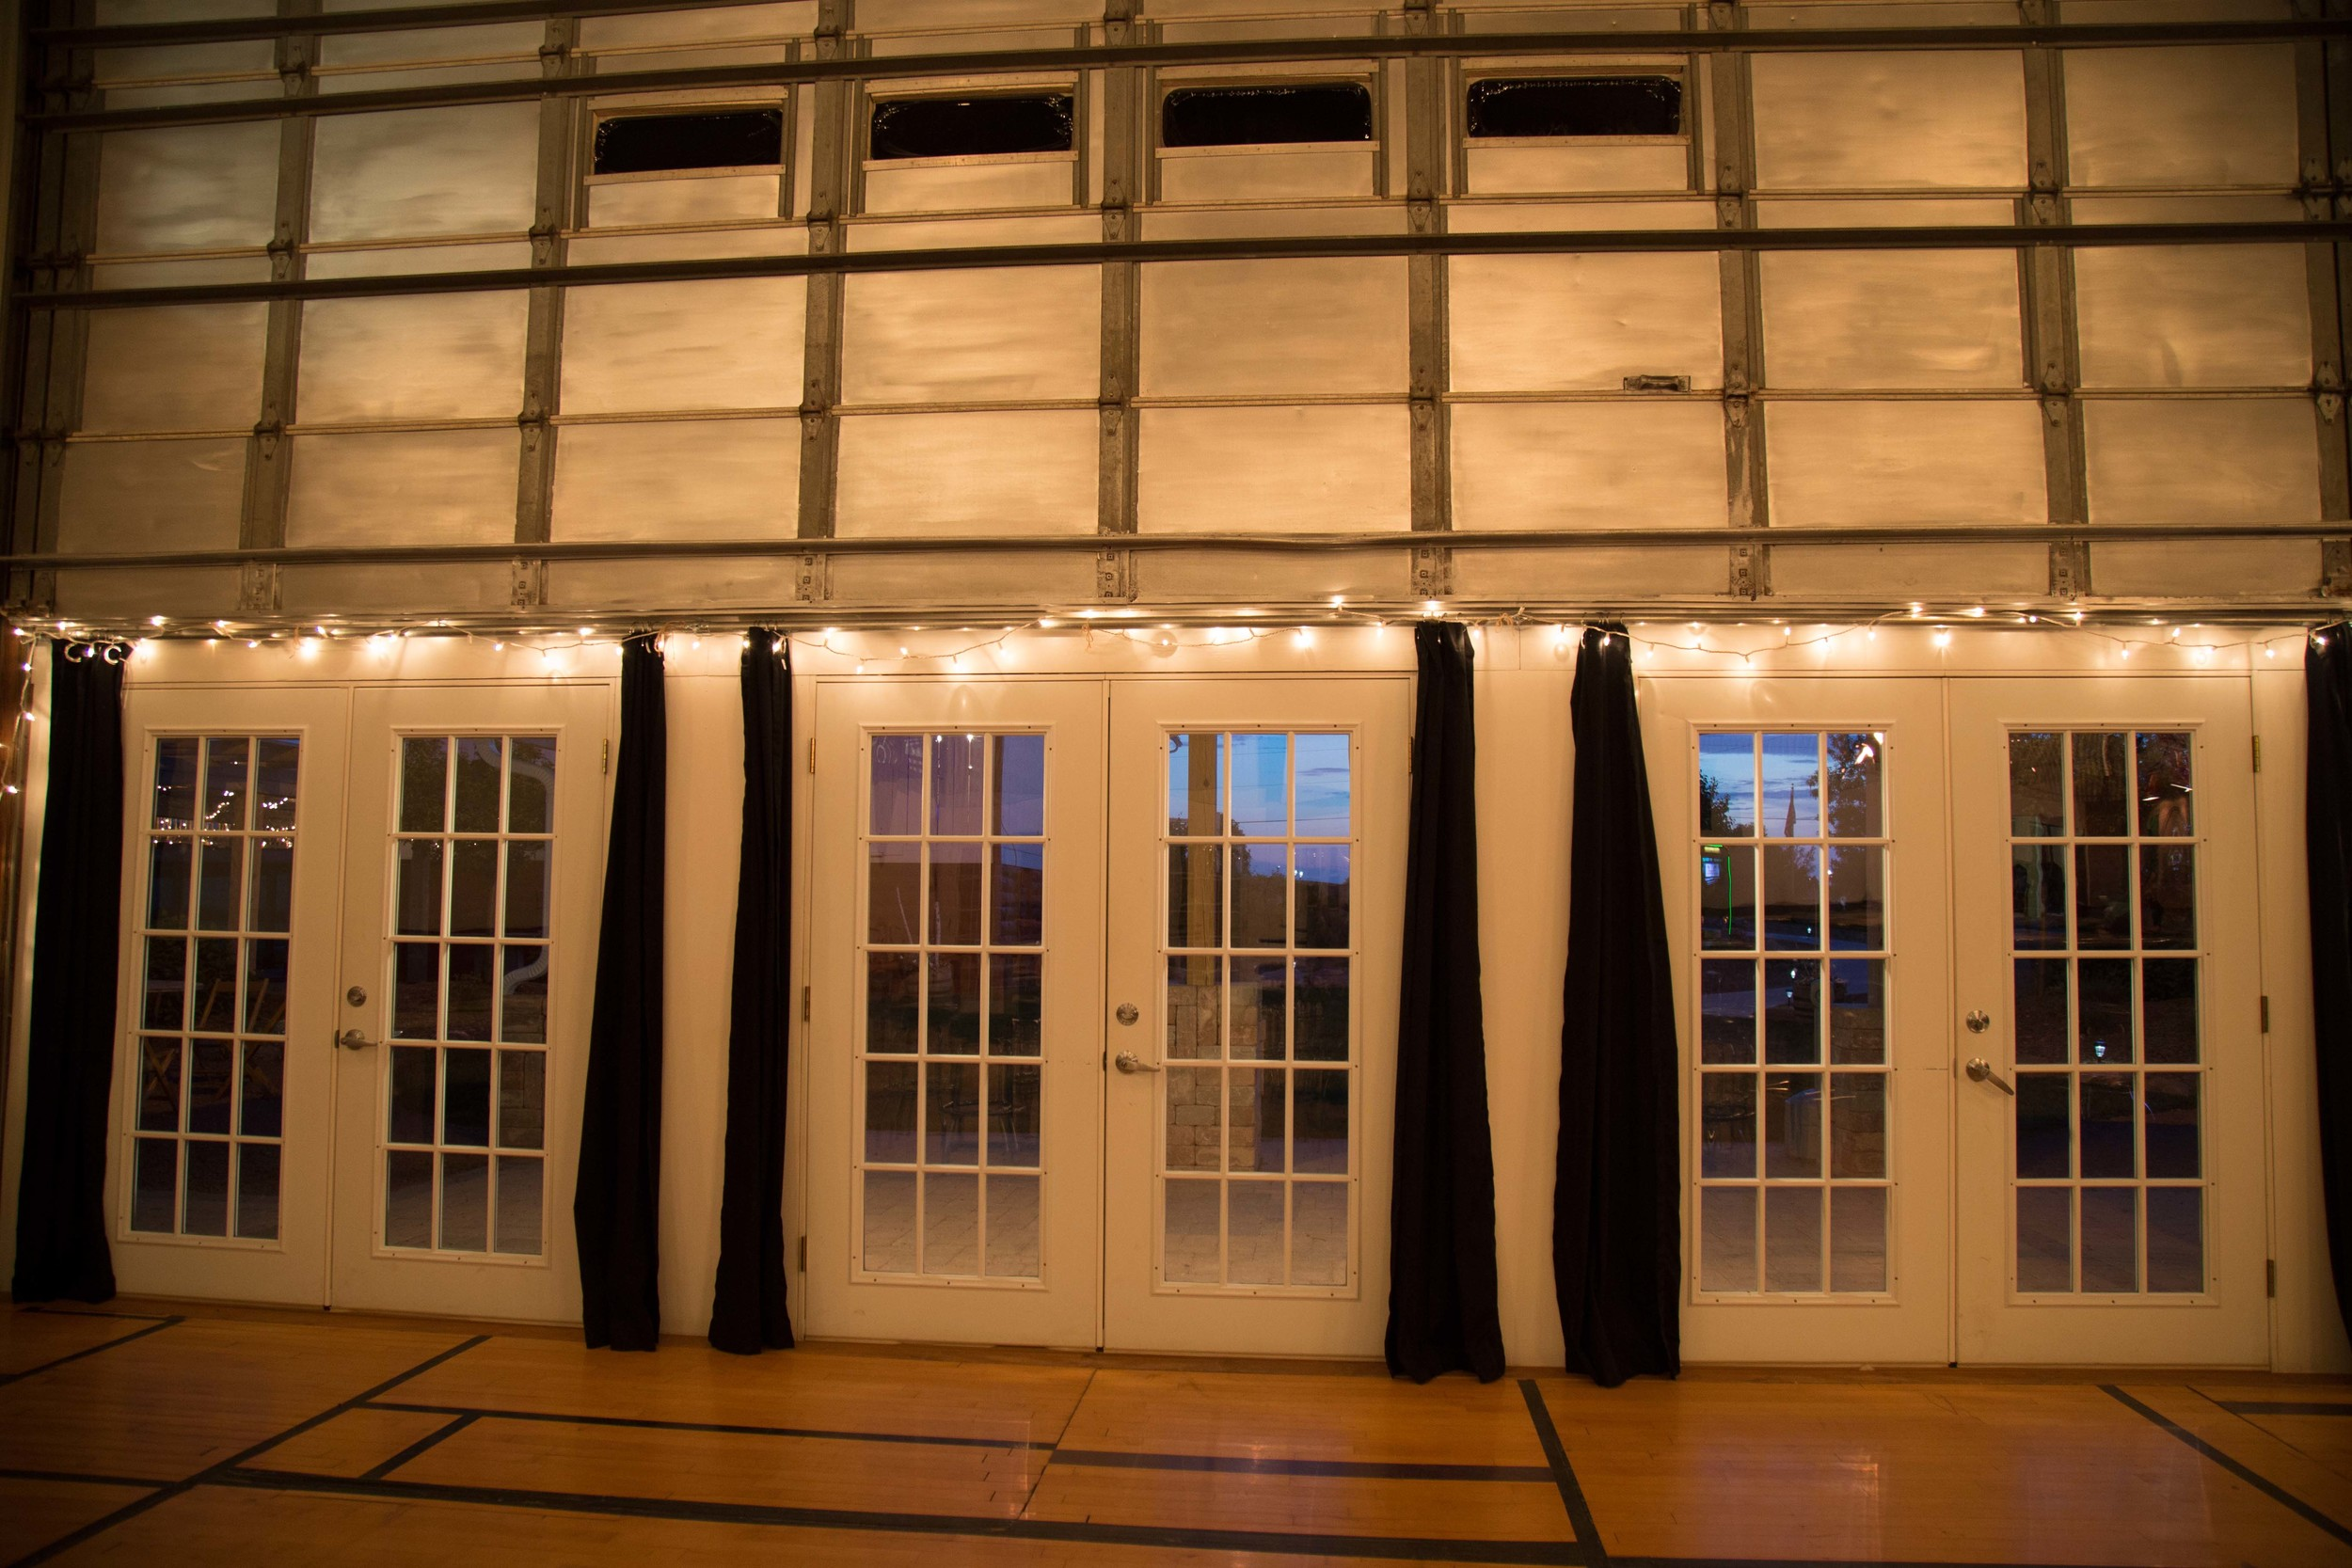 6_6-French_Doors_Lights_5554 2.jpg